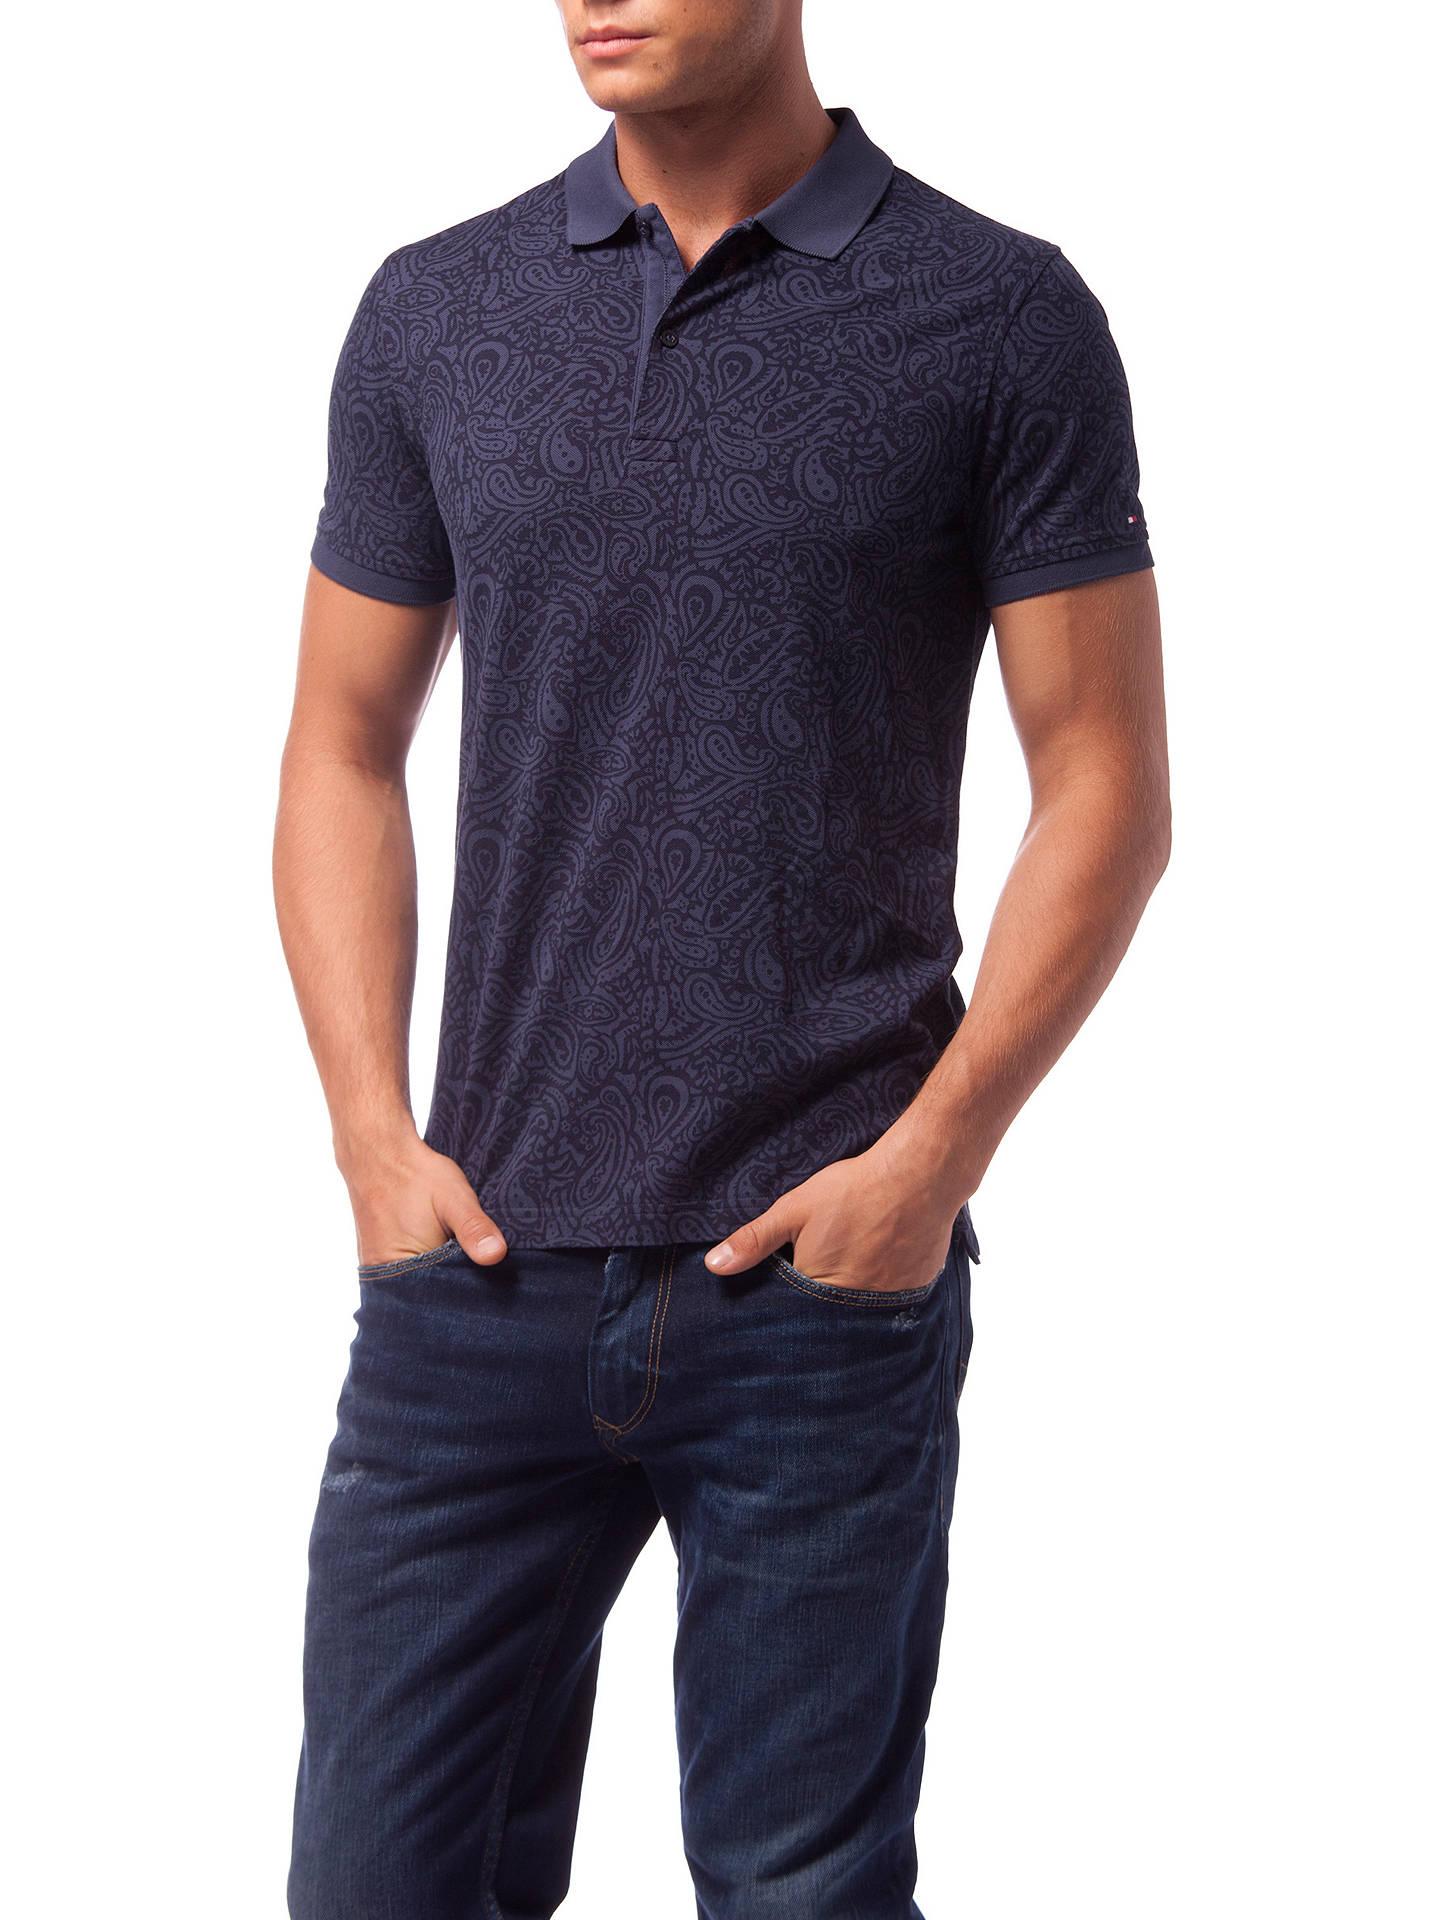 6f0c6c8e Buy Tommy Hilfiger Alan Paisley Print Slim Polo Shirt, Navy, M Online at  johnlewis ...